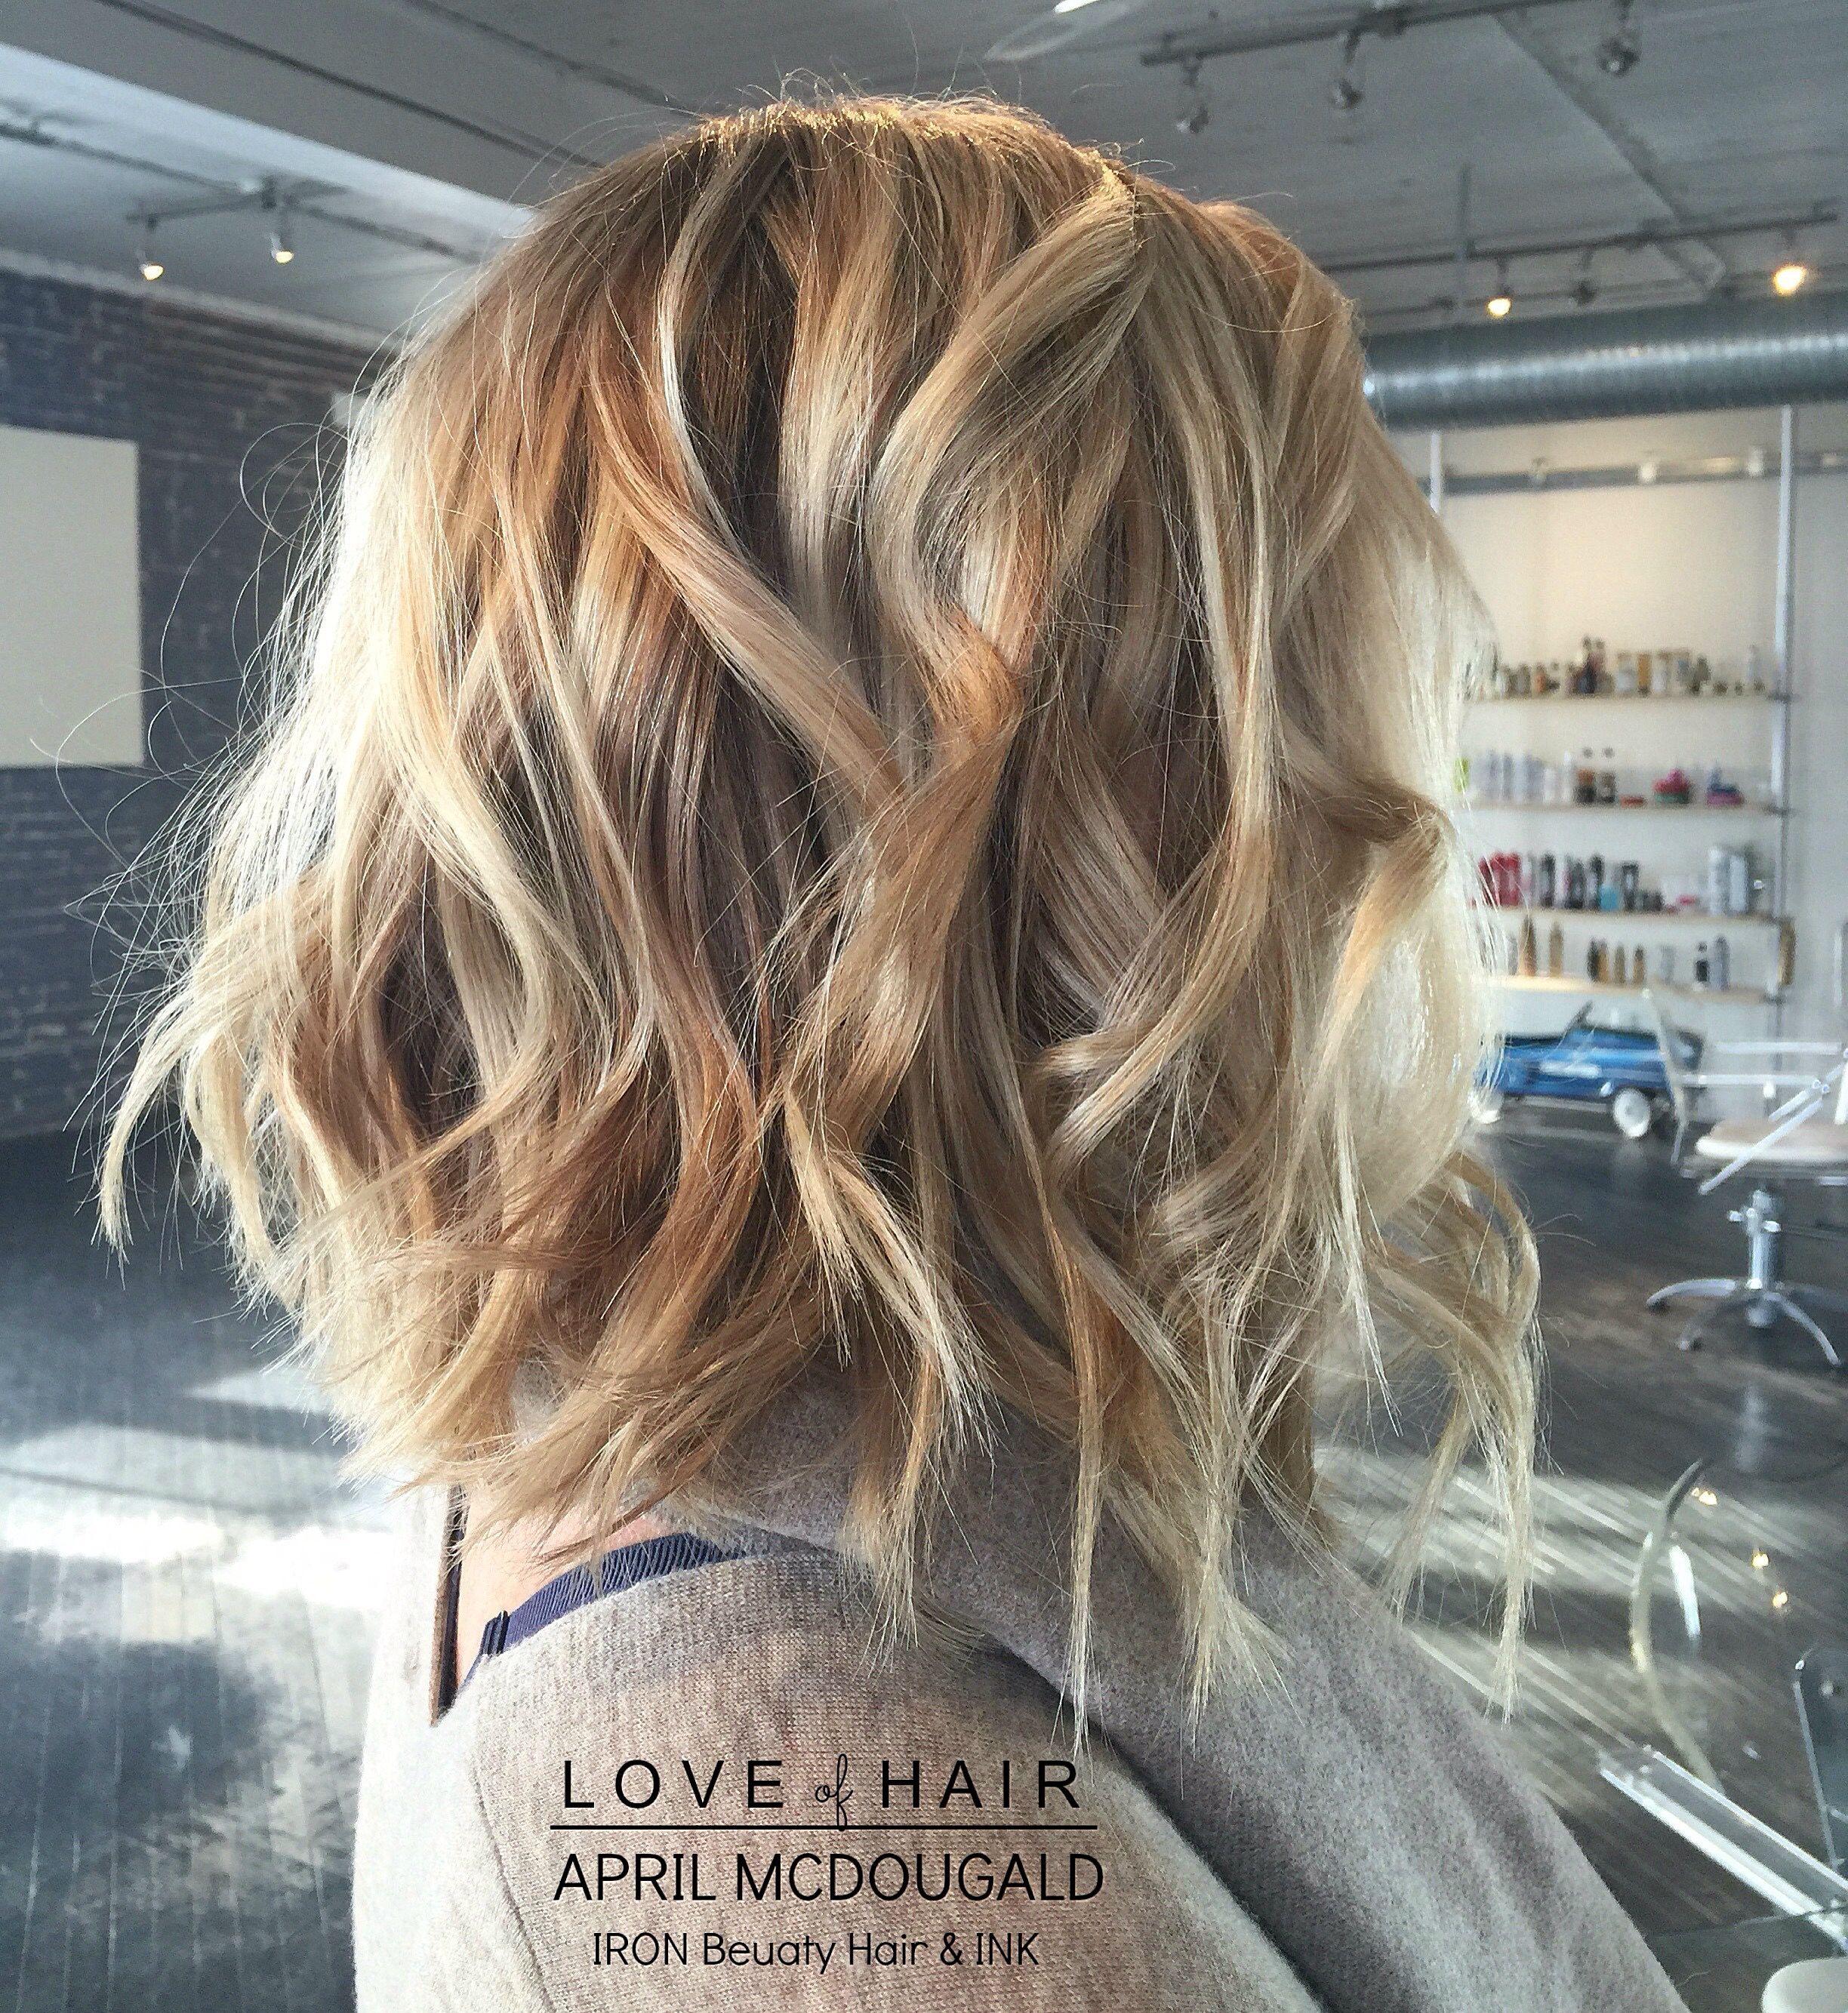 Balayage Blonde Hair Lob Short Hair Curls Highlights Lowlights